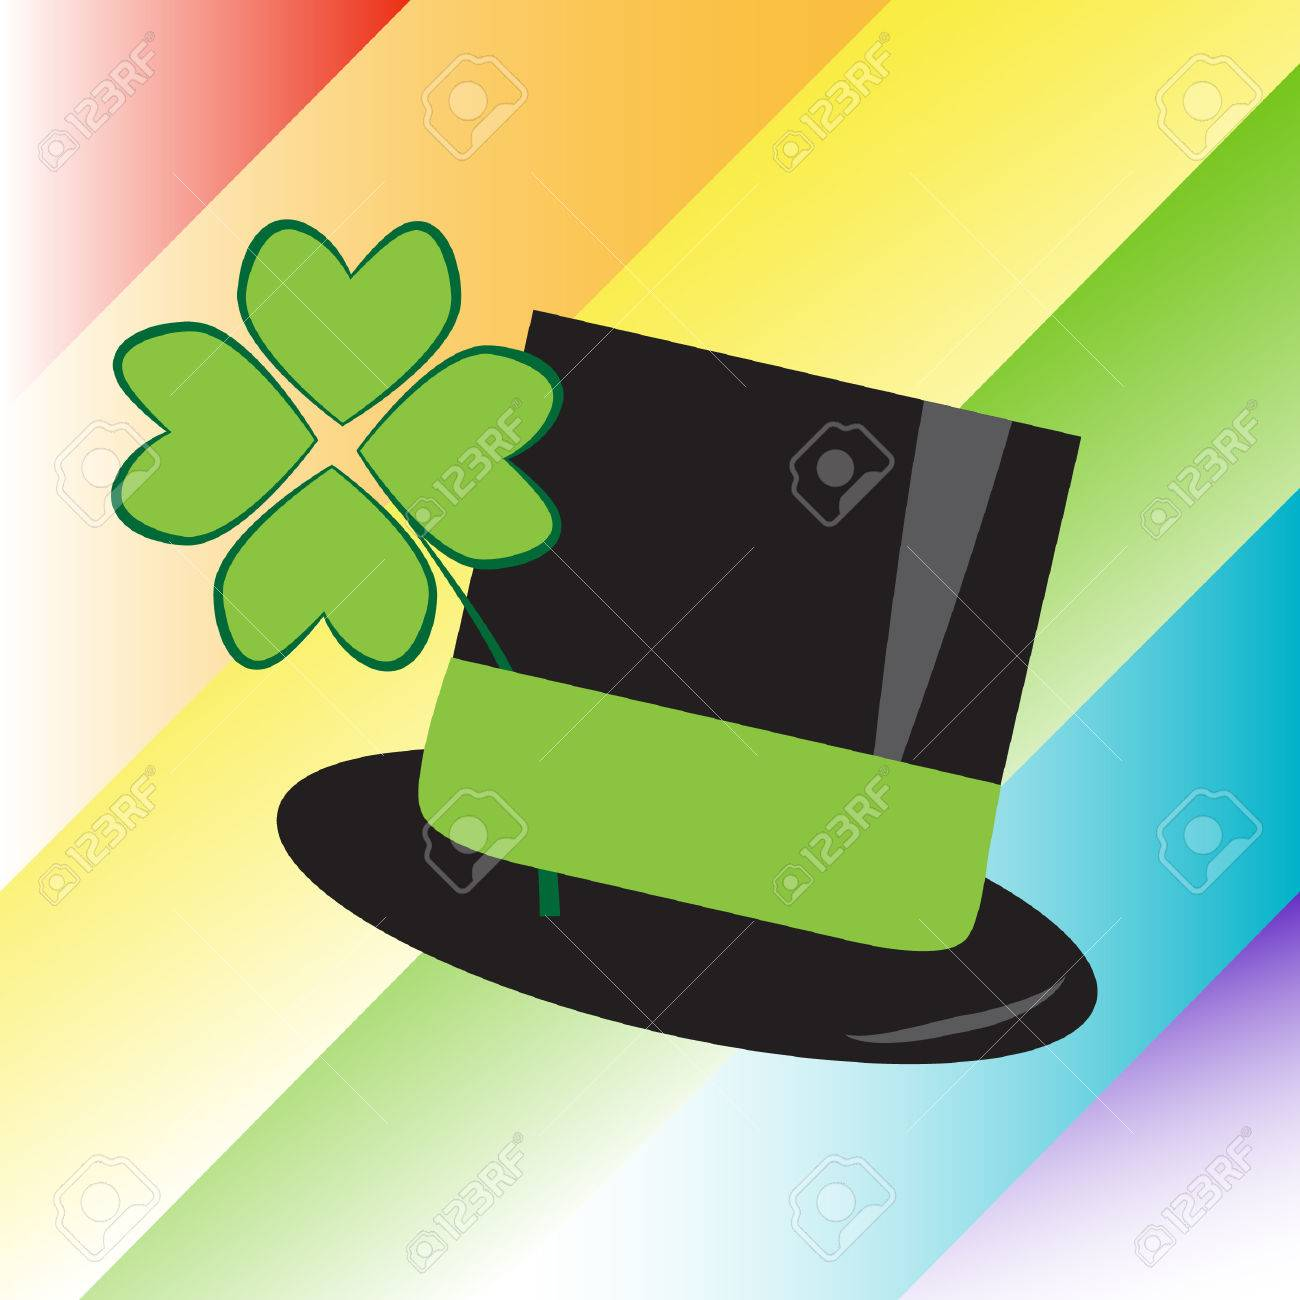 St Patricks Day Rainbow Hat Stock Vector - 8706416